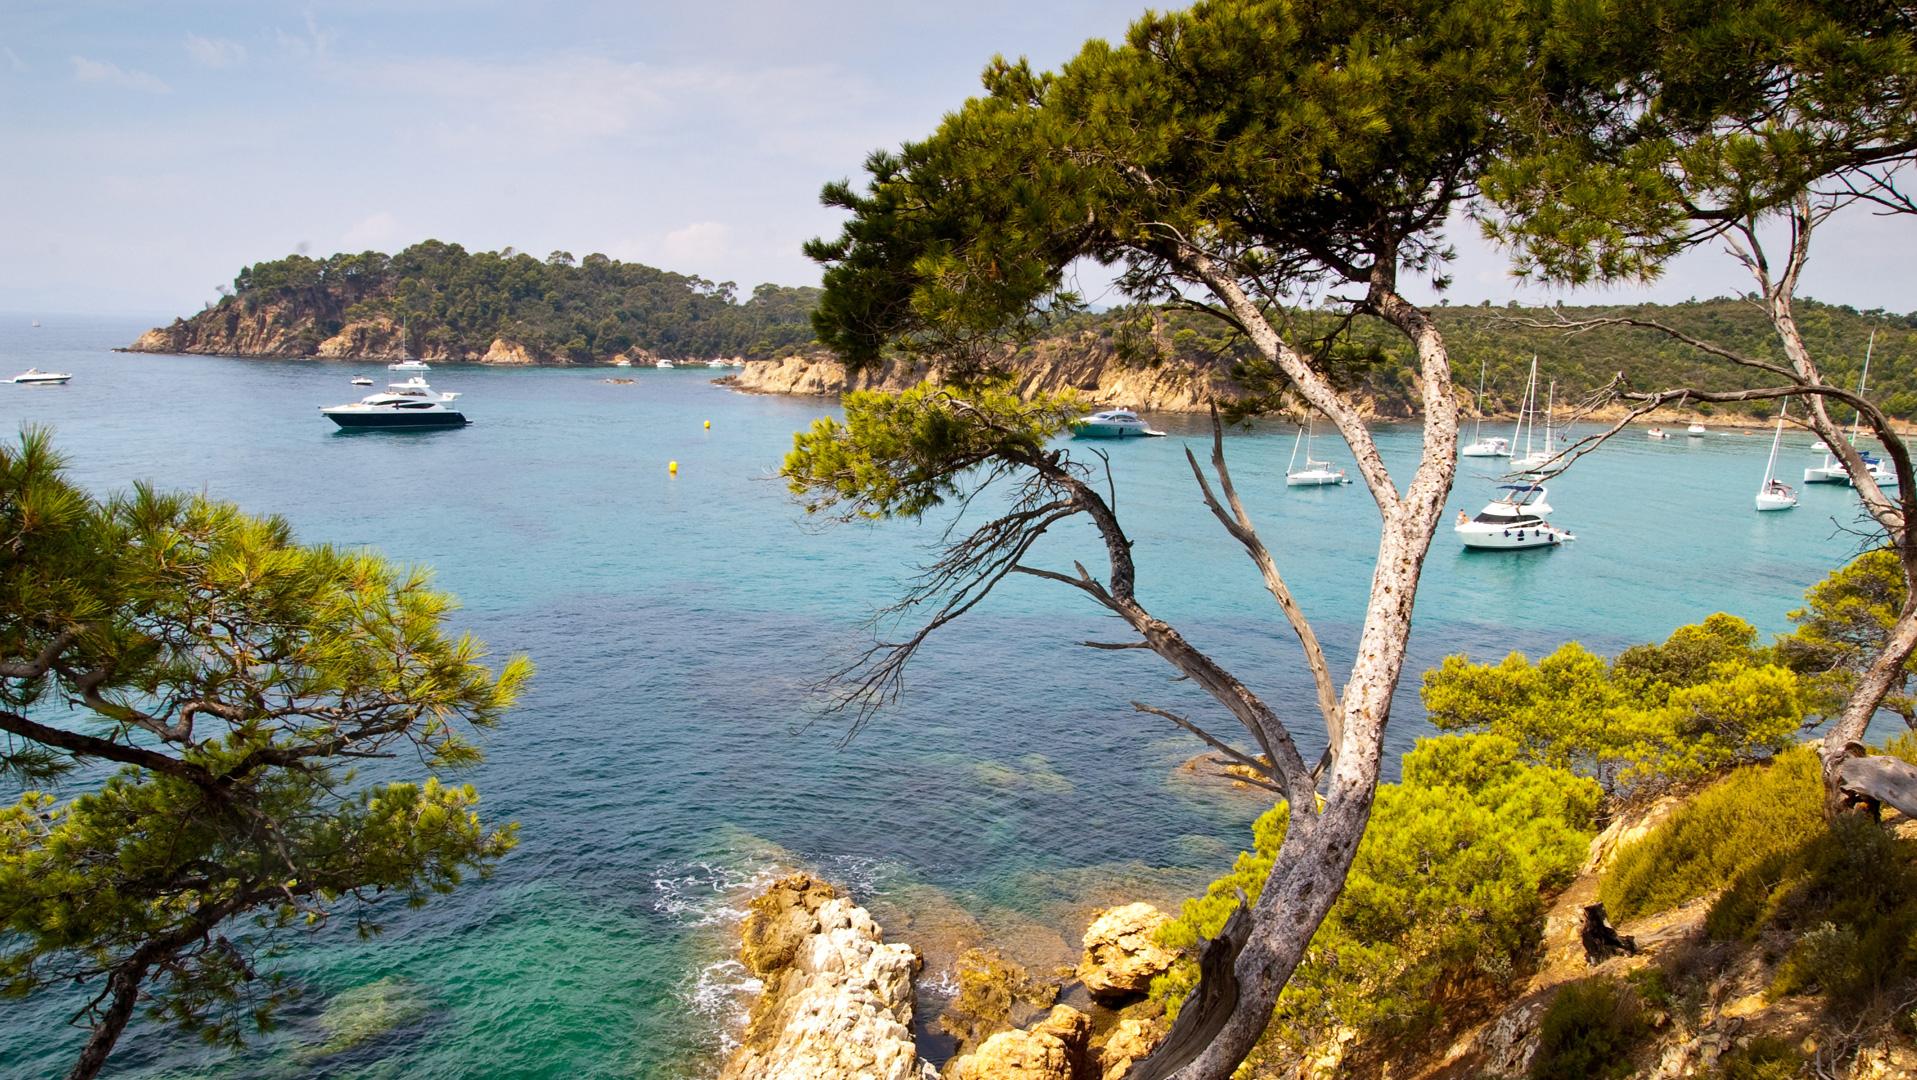 Camping Toulon Avec Piscine - Var 83 concernant Camping Var Bord De Mer Avec Piscine